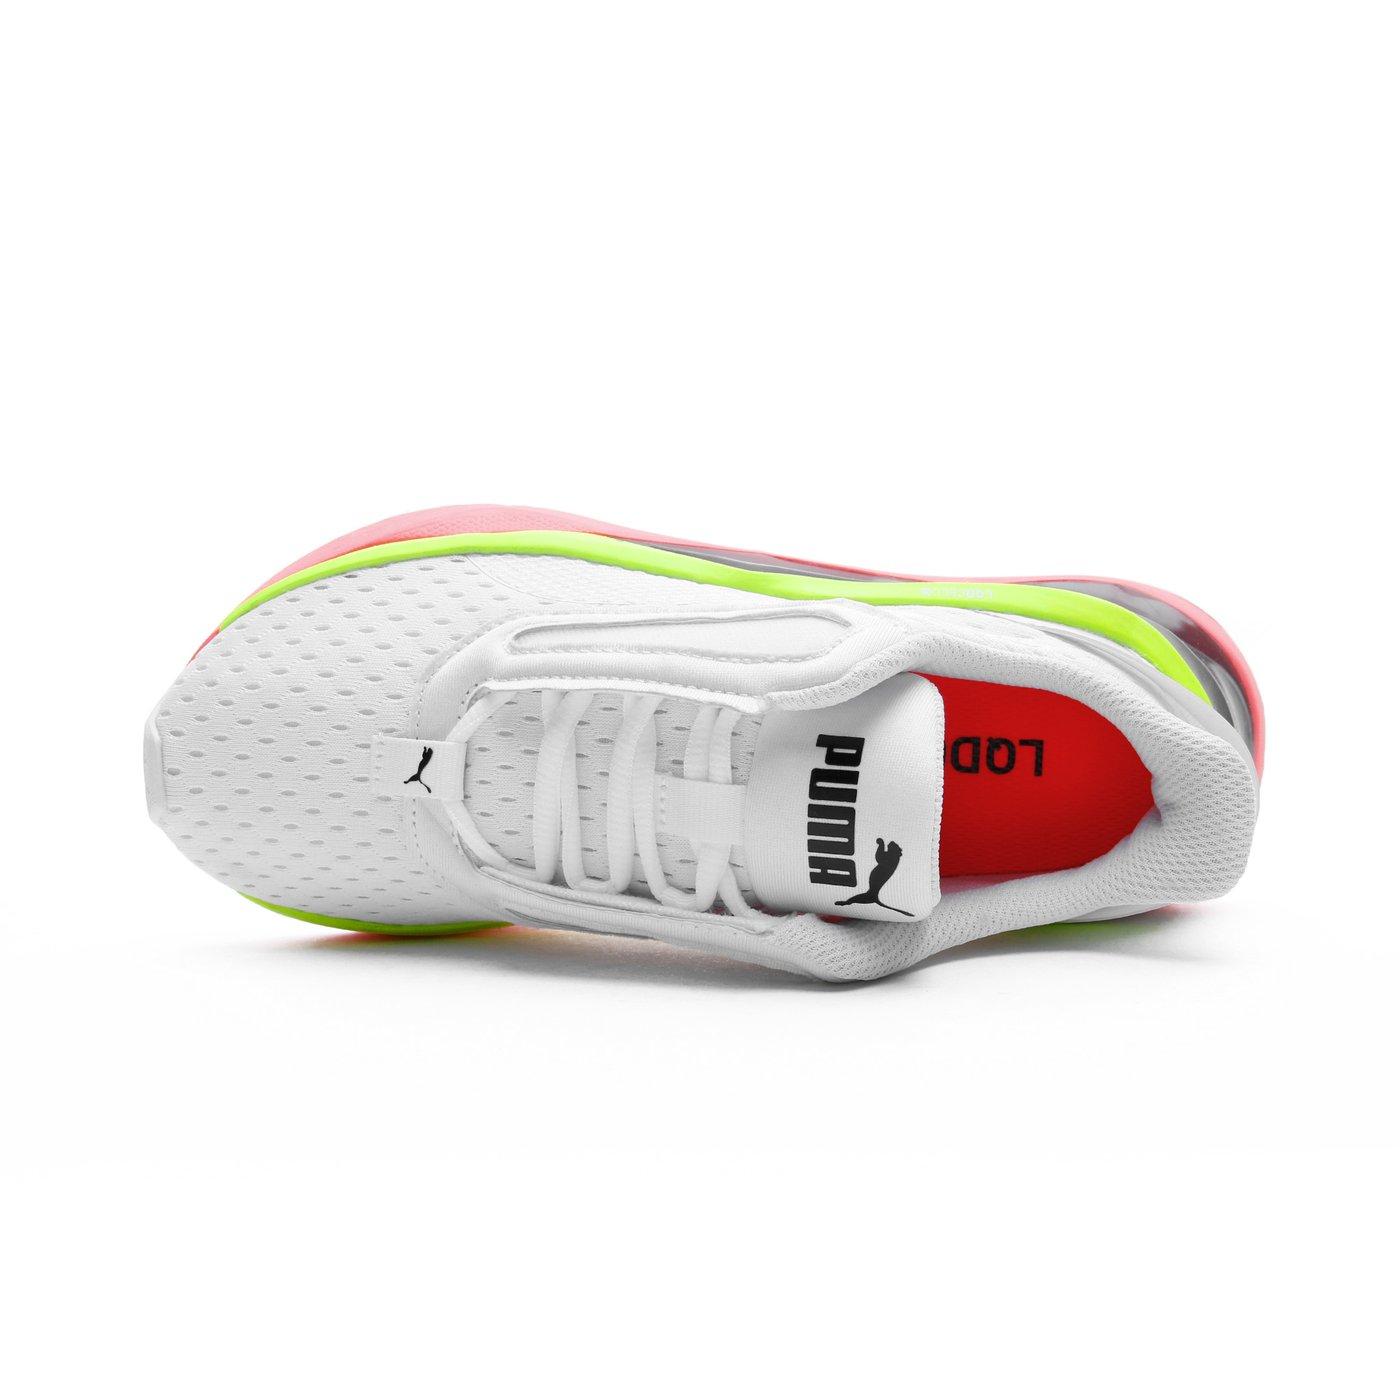 Puma LQDCell Shatter Xt Kadın Beyaz Spor Ayakkabı